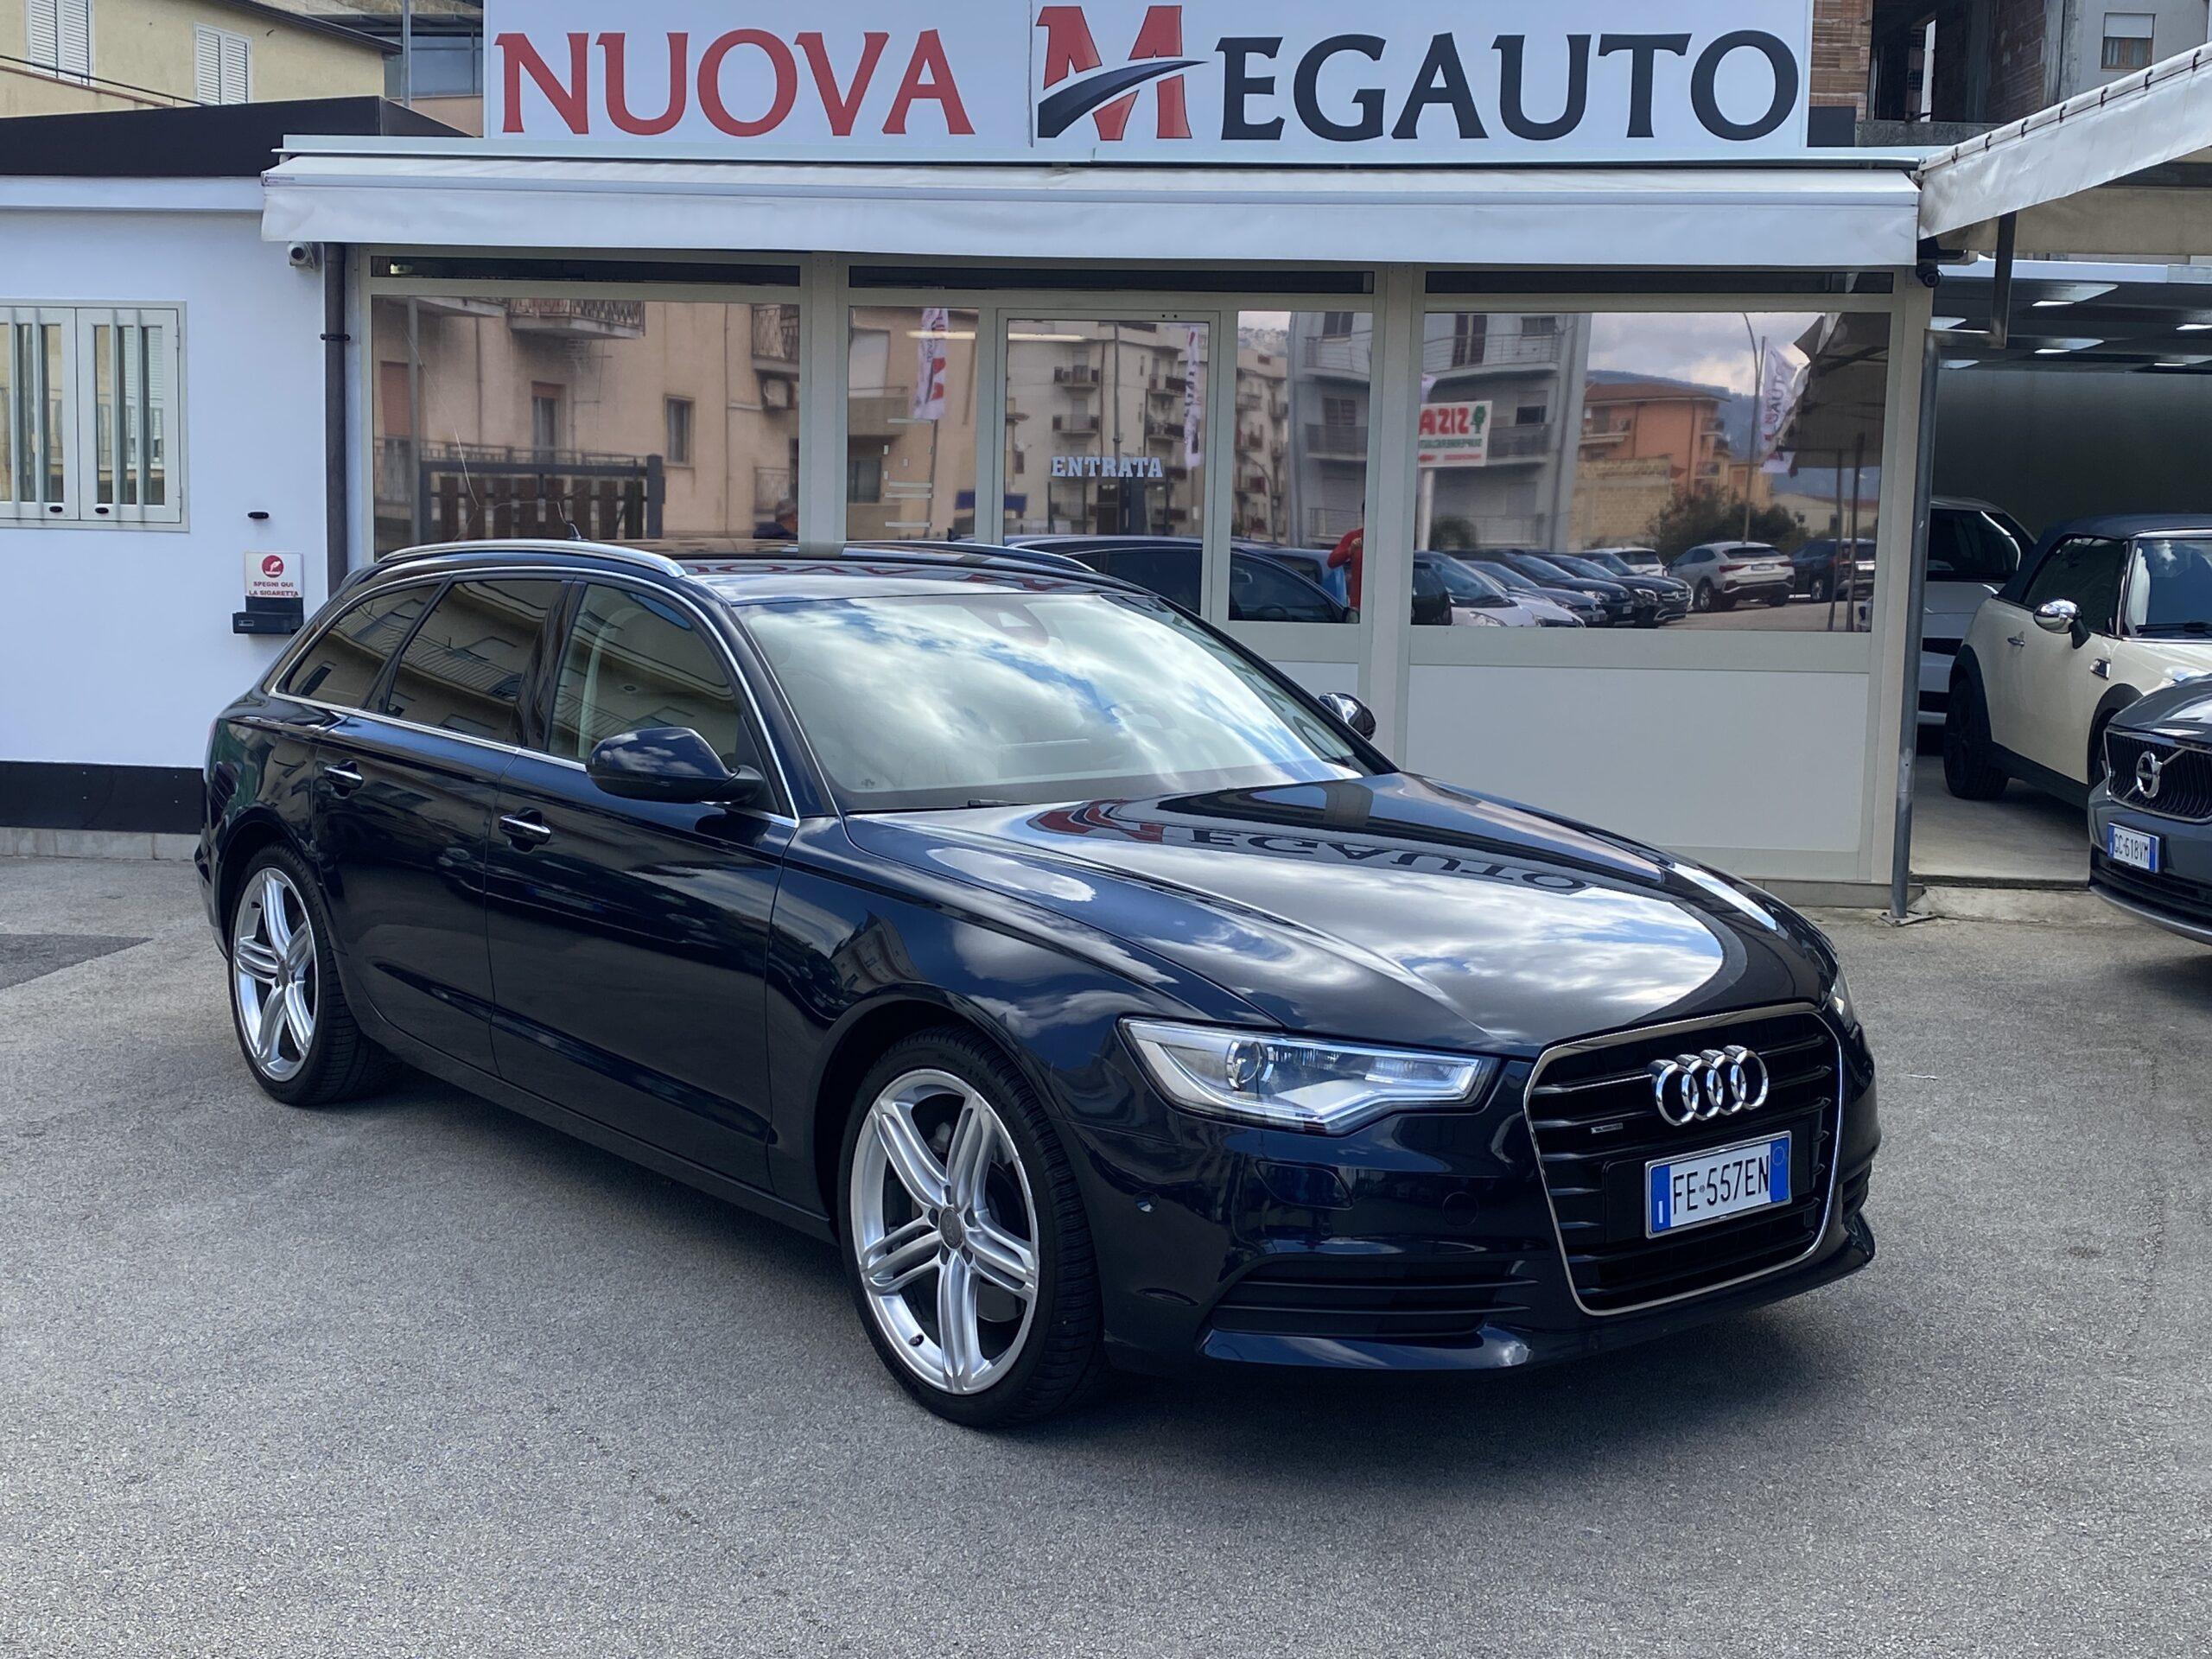 Audi A6 Avant 3.0 TDI 245CV Clean Diesel Qu. S Tronic Advanced